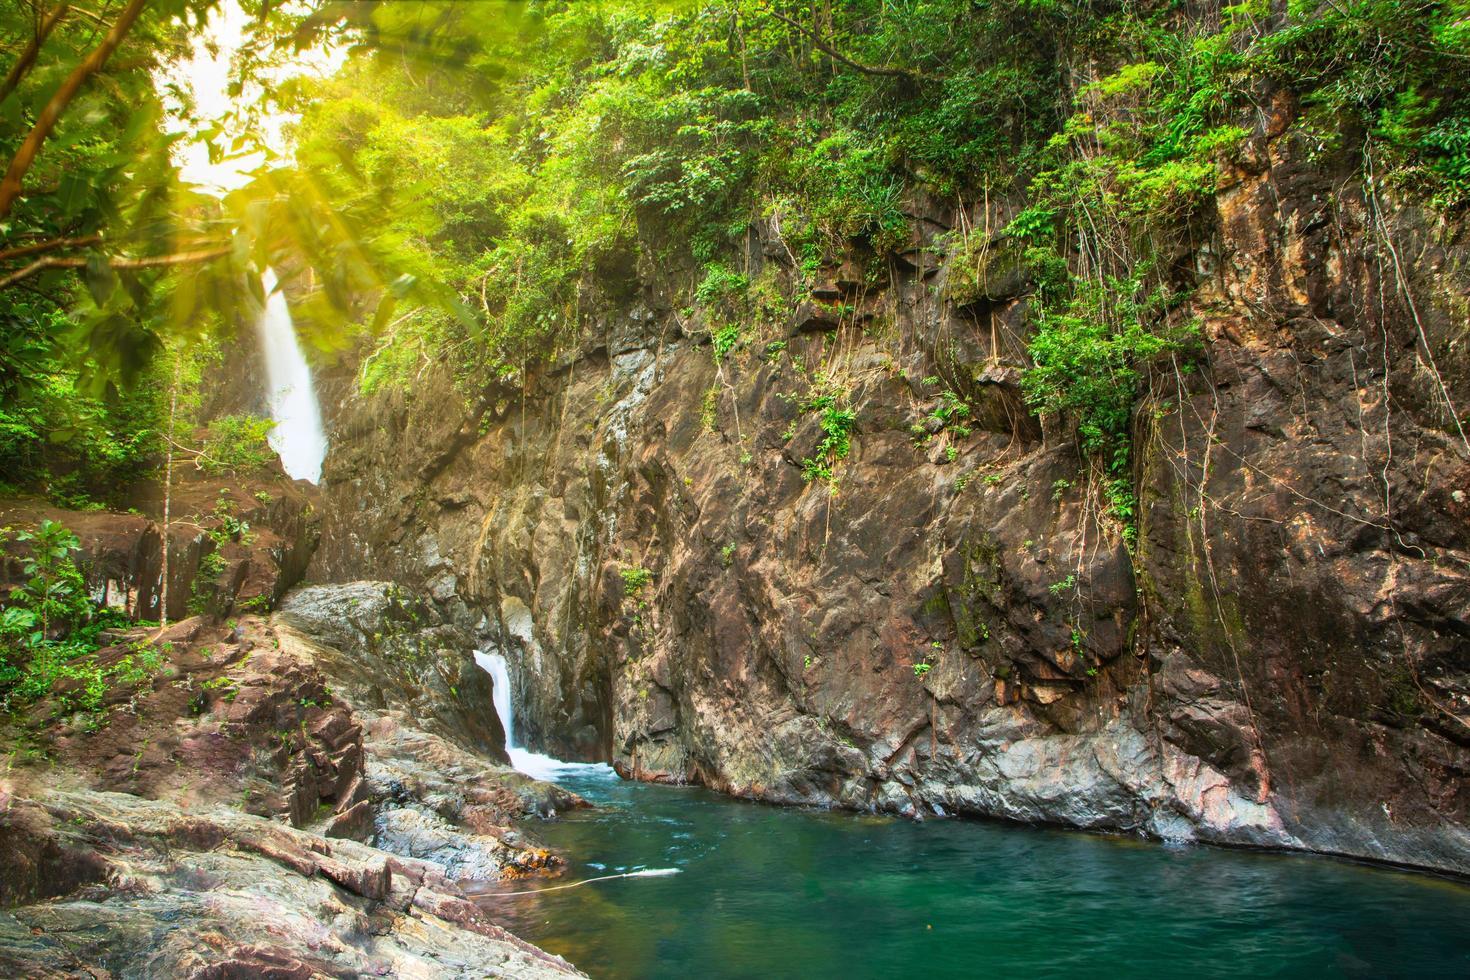 Klong Plu Koh Chang waterfall, Thailand photo